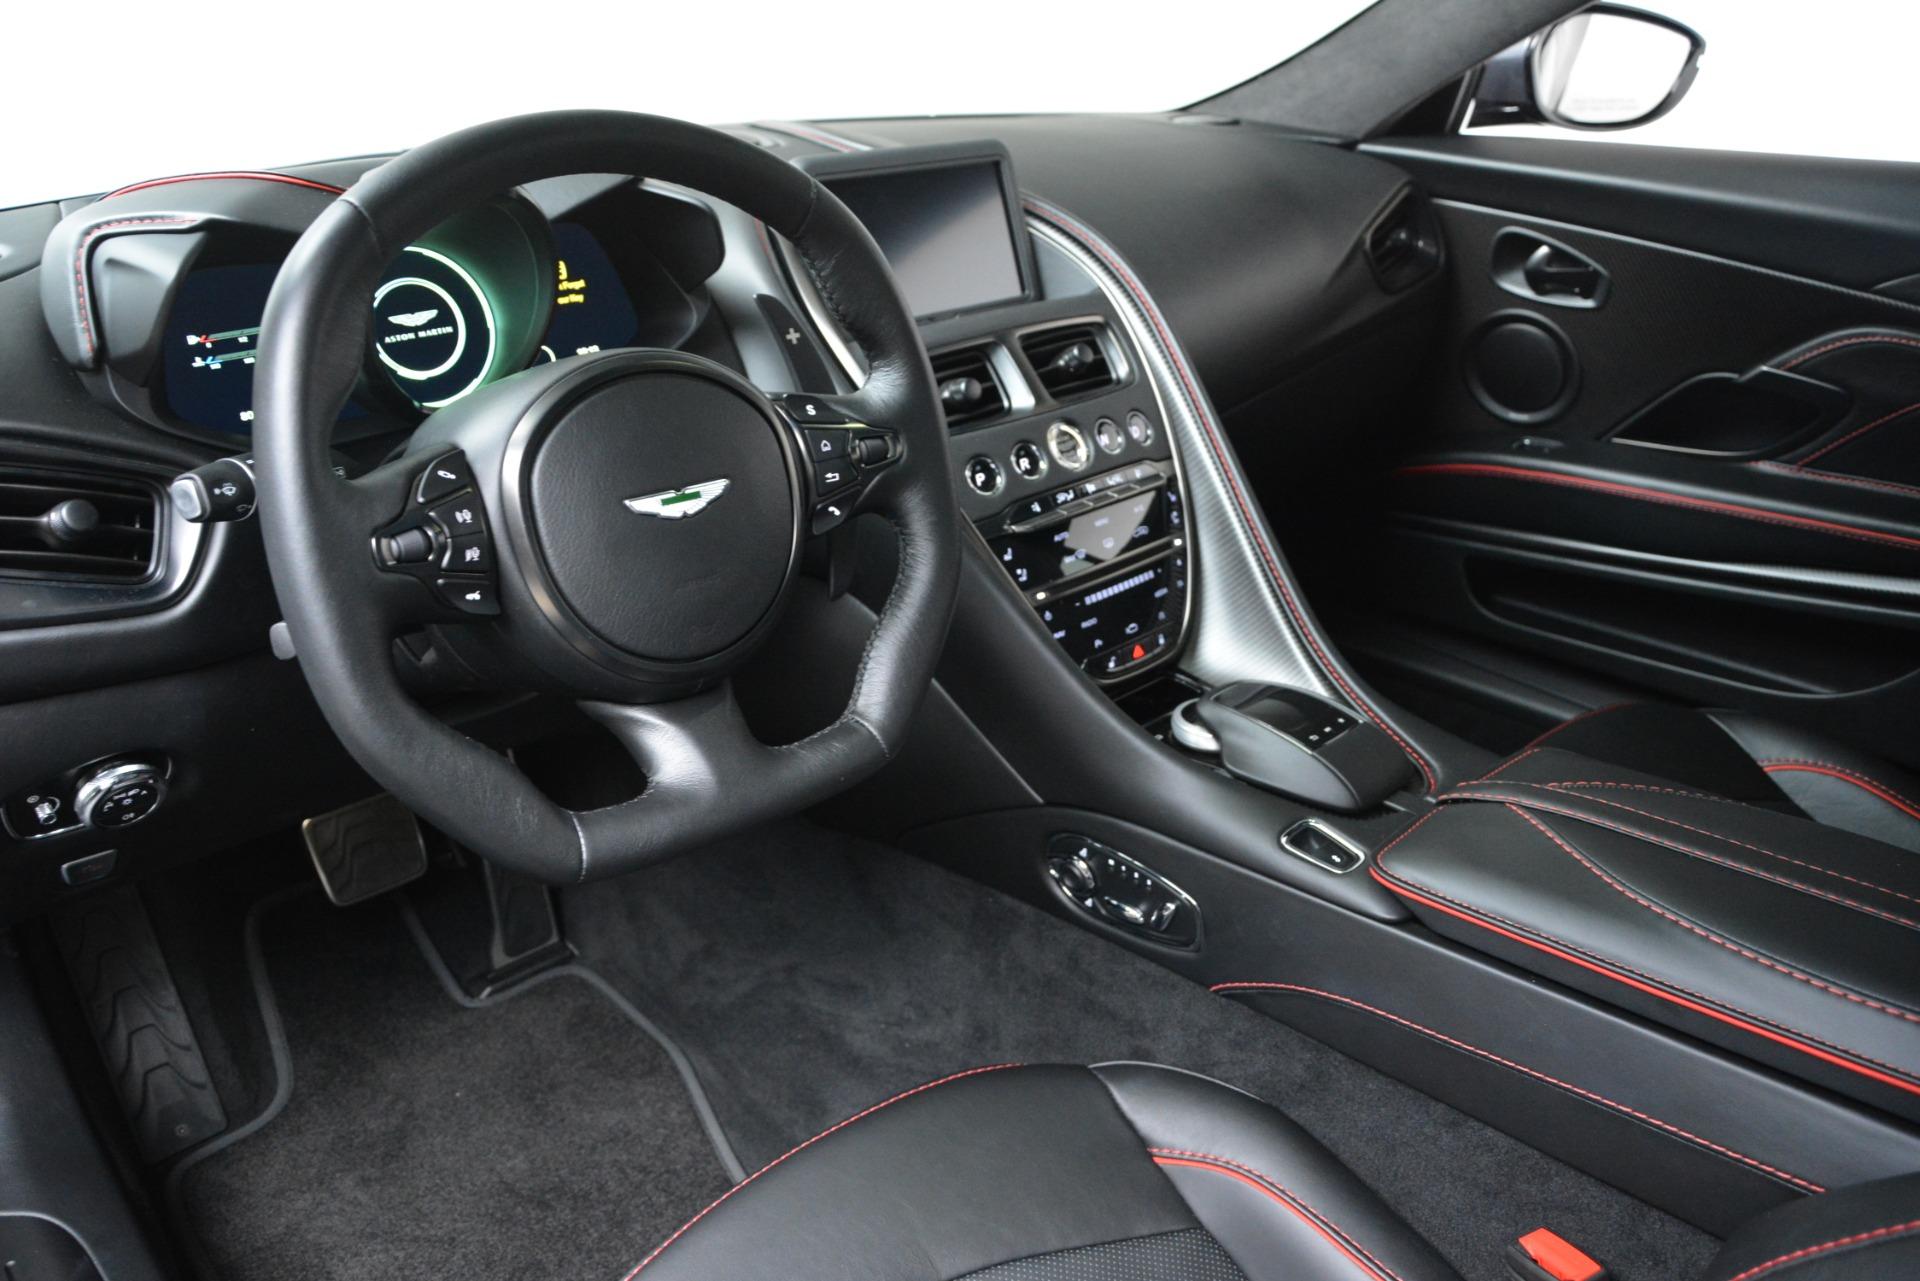 New 2019 Aston Martin DBS Superleggera For Sale In Westport, CT 3318_p11